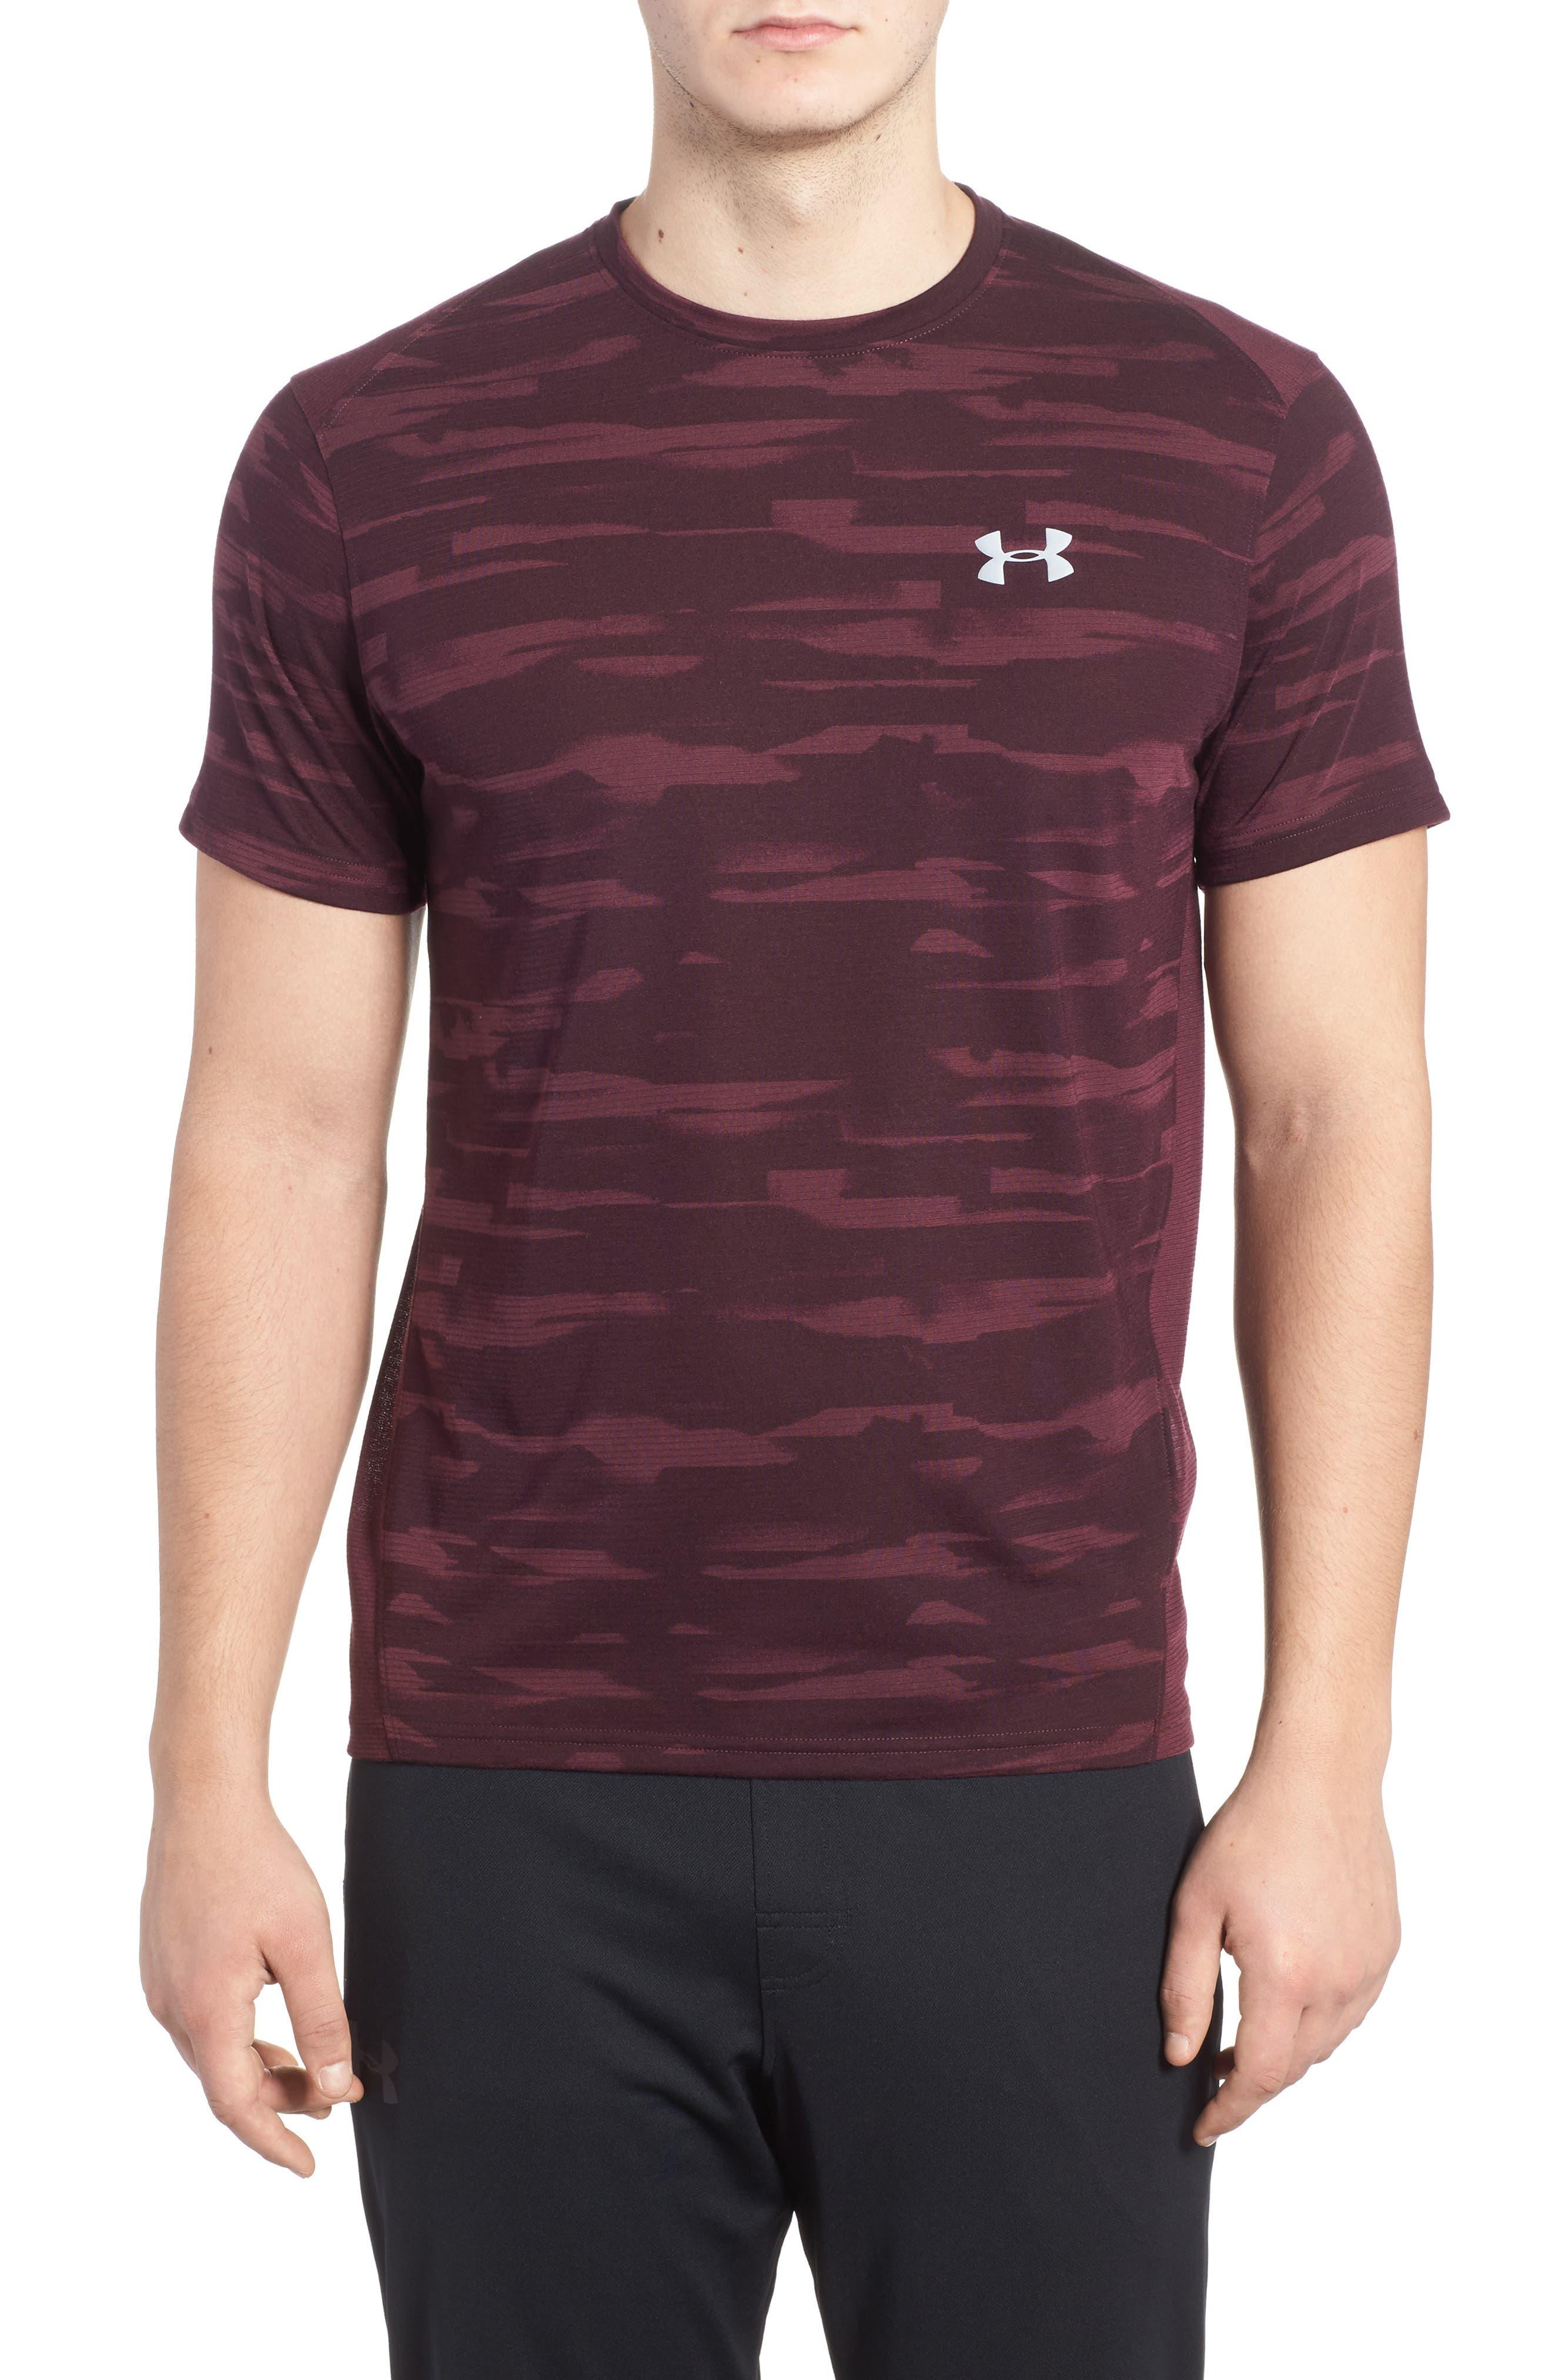 Main Image - Under Armour Threadborne Mesh Running T-Shirt